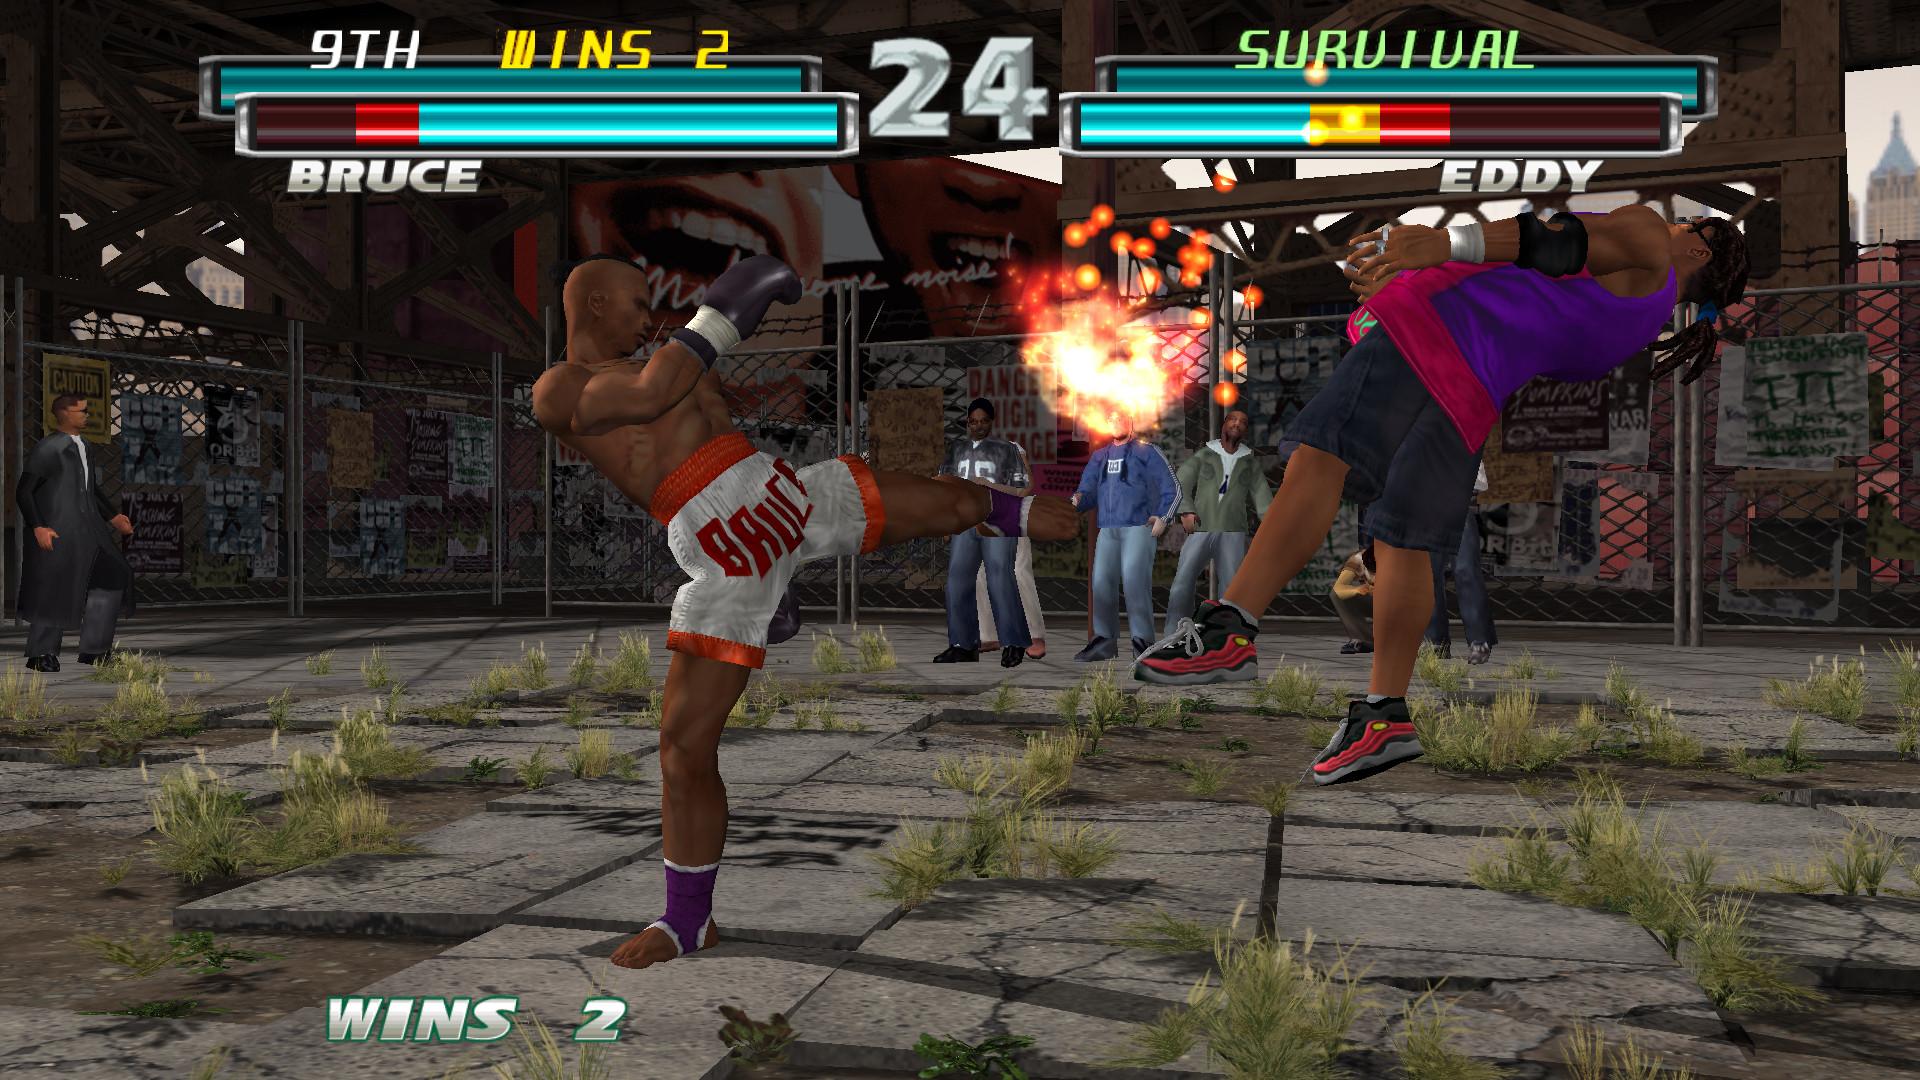 Tekken tag tournament 2 pc game download full v.